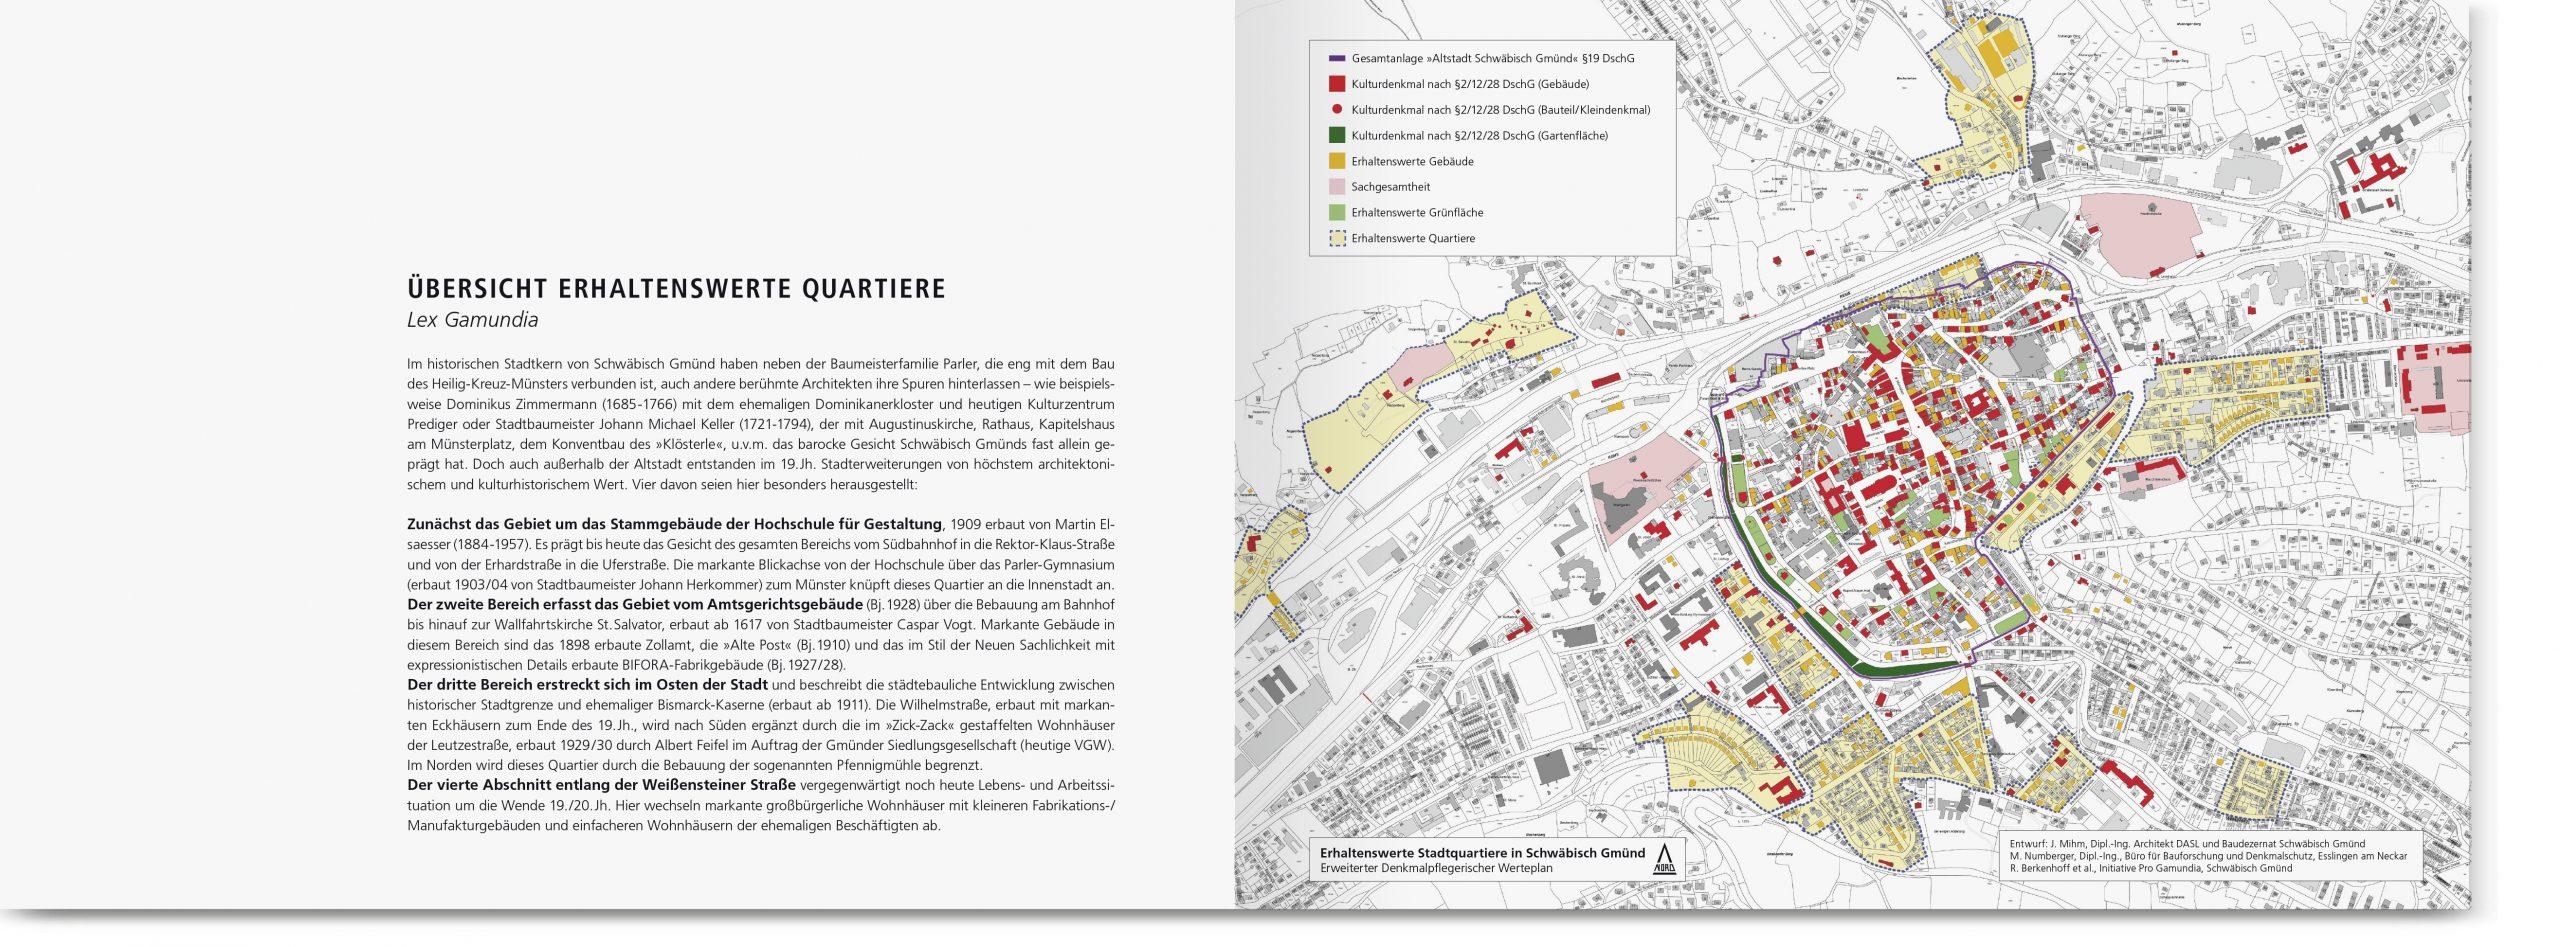 fh-web-kompendium-baukultur-3-scaled.jpg